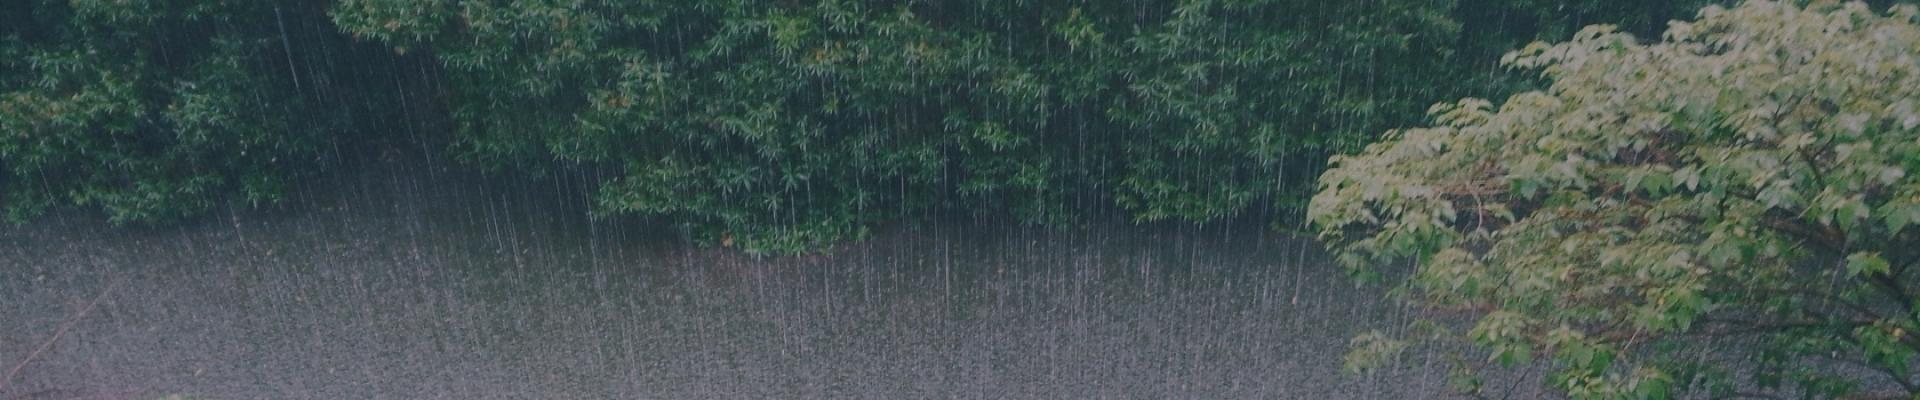 Monsoon treks in Himachal Pradesh, India